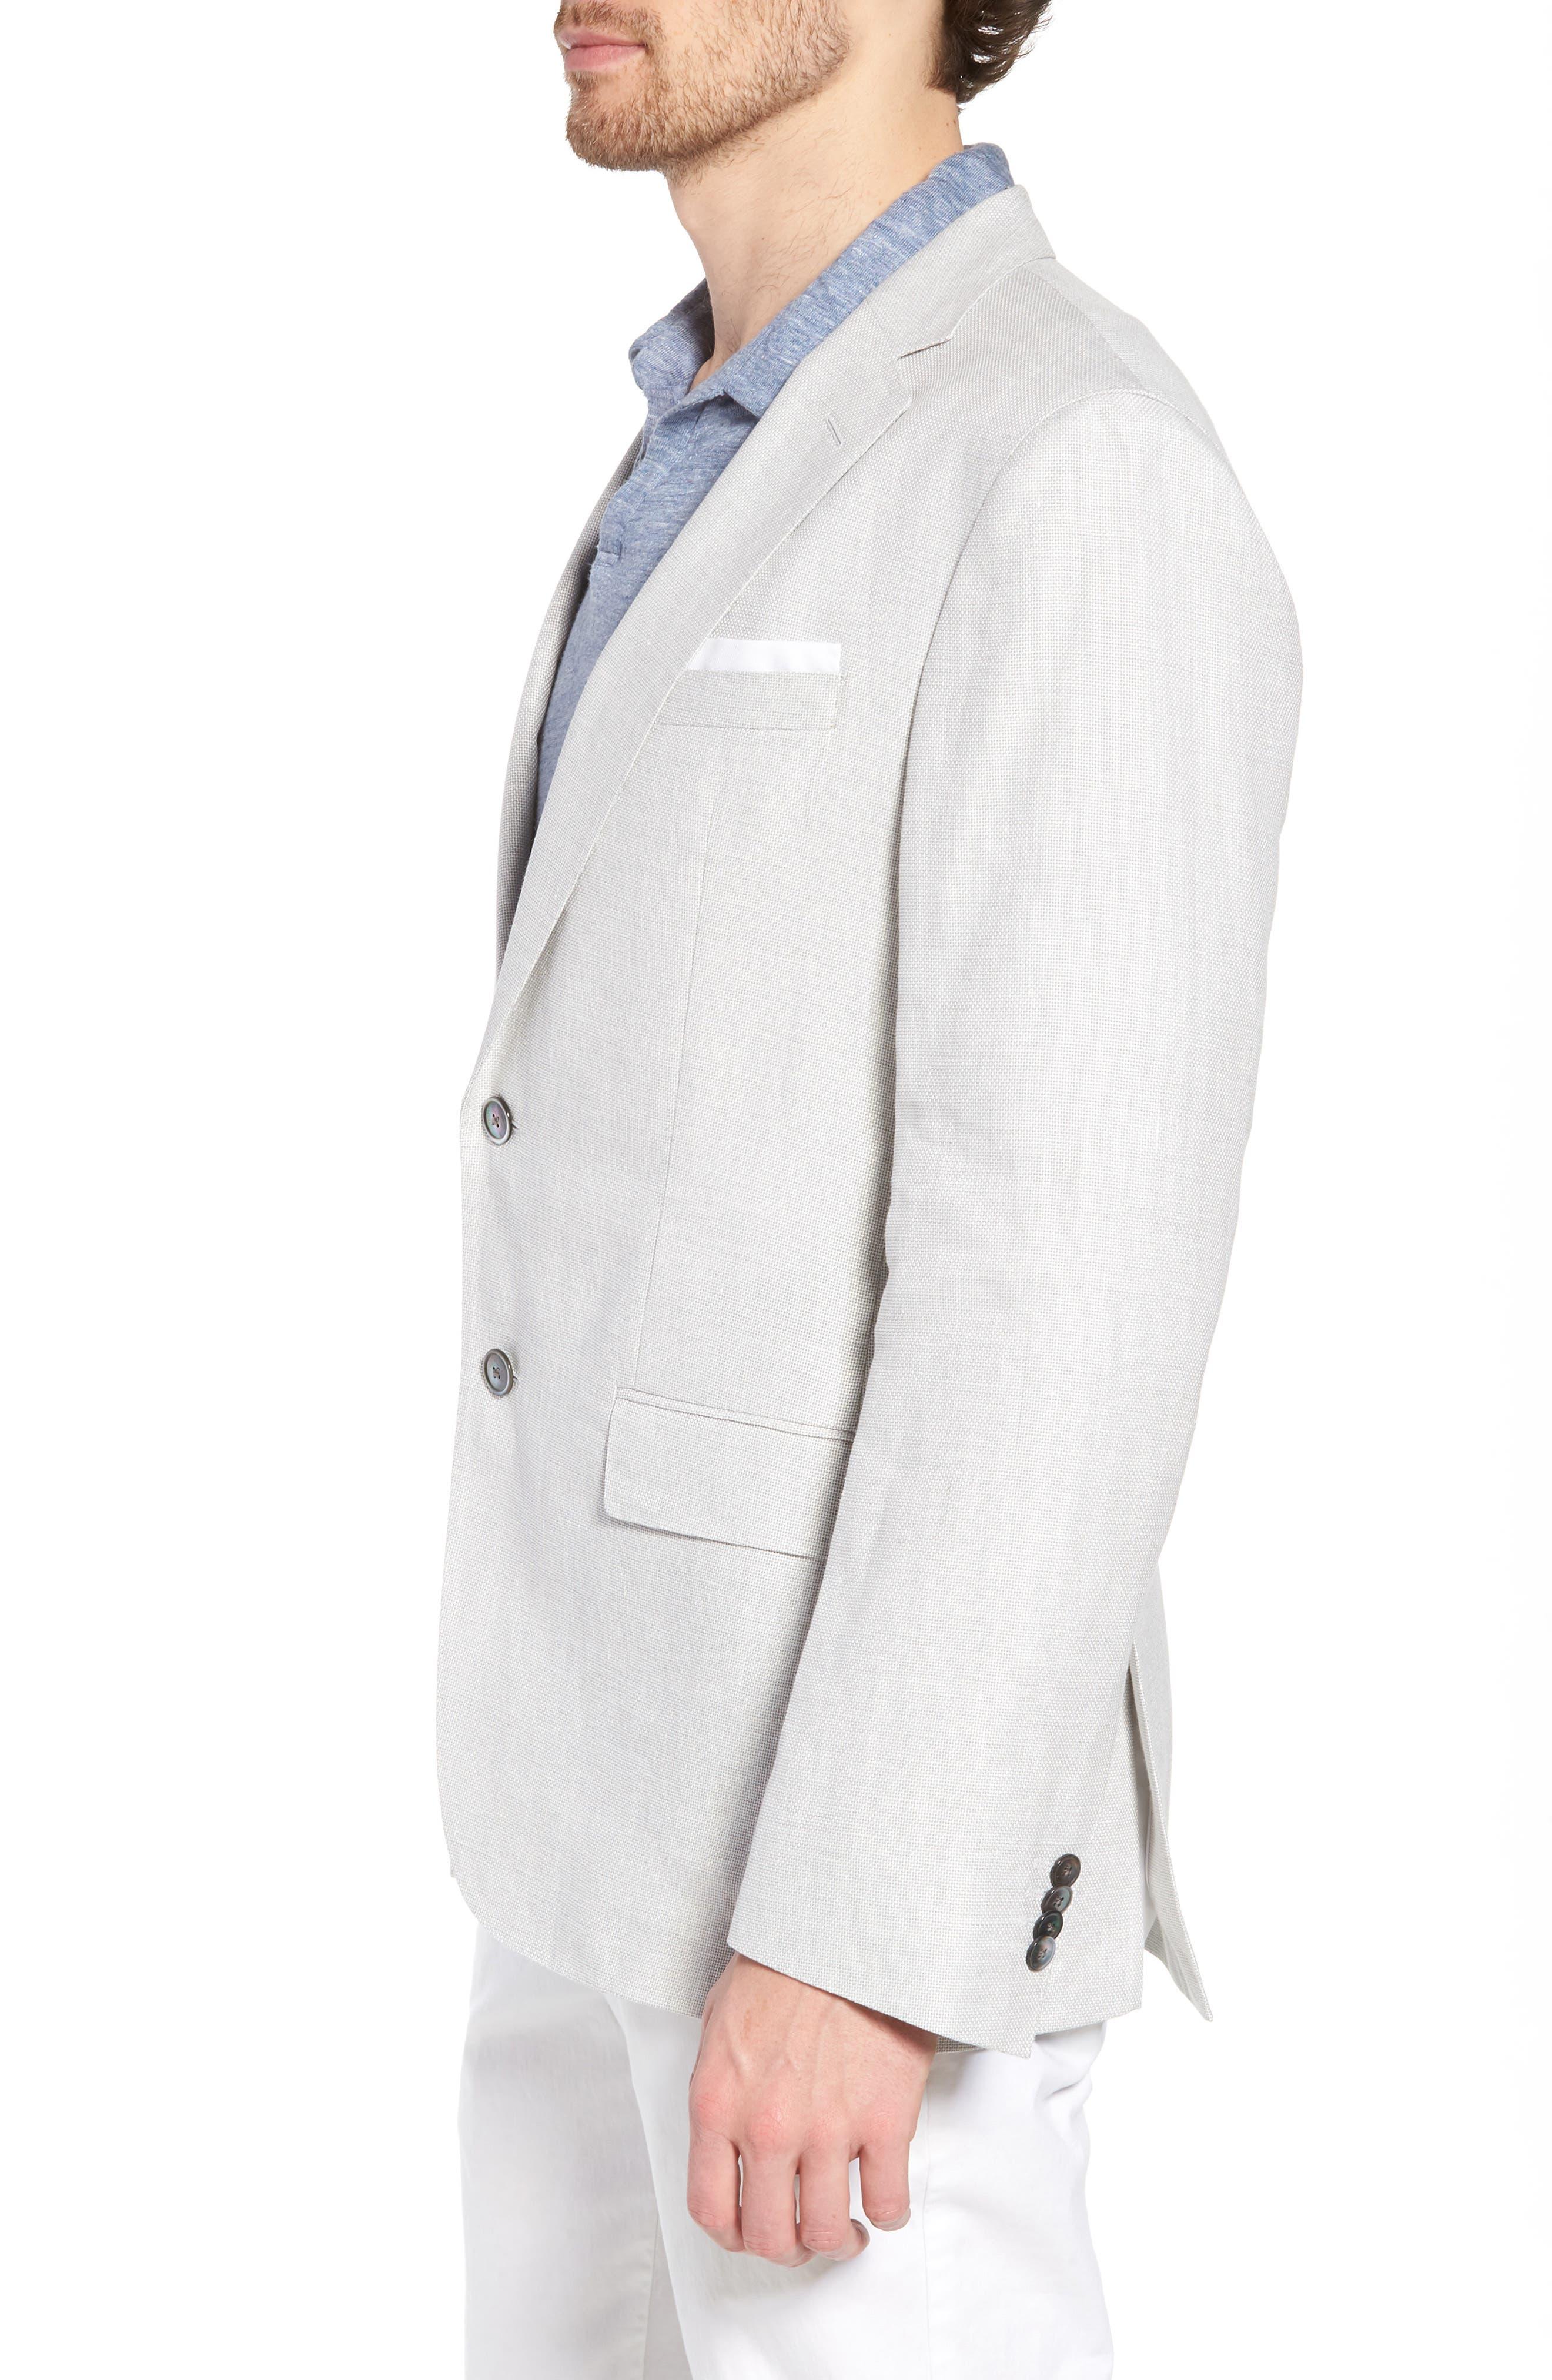 Hartlay Trim Fit Linen Blend Blazer,                             Alternate thumbnail 3, color,                             Silver Grey